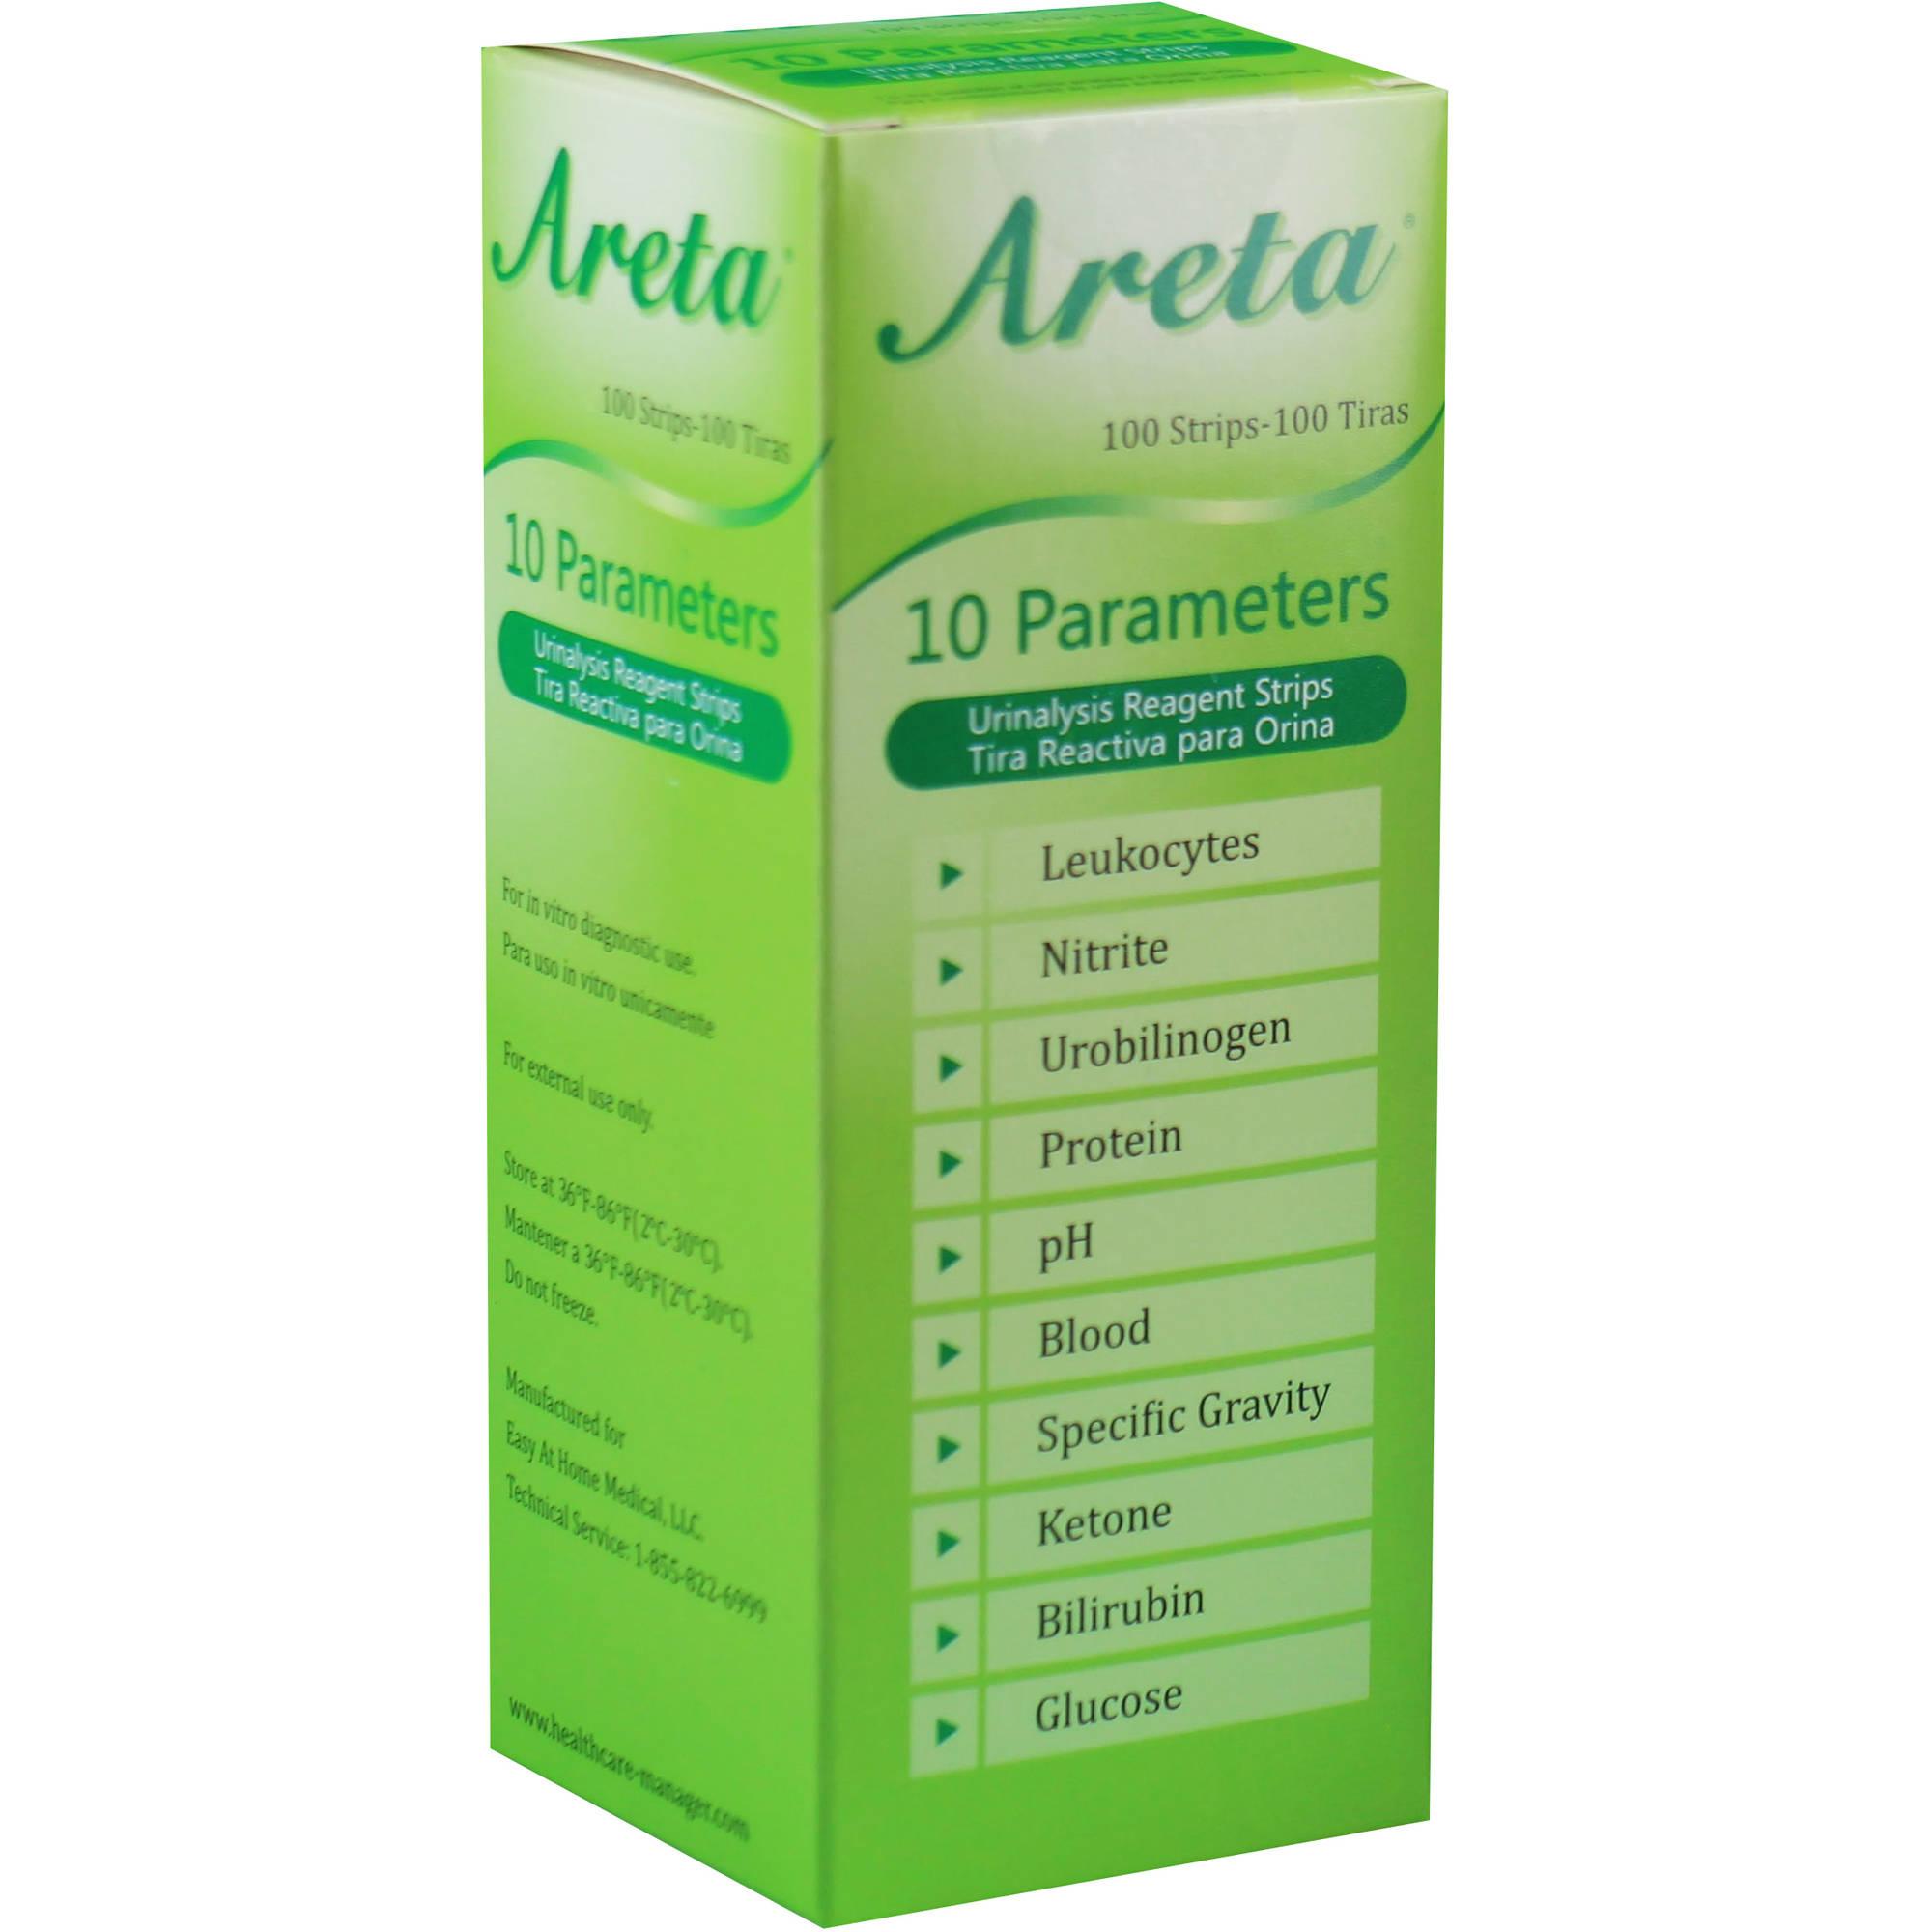 Areta 10 Parameter Urinalysis Reagent Test Strips, 100 count